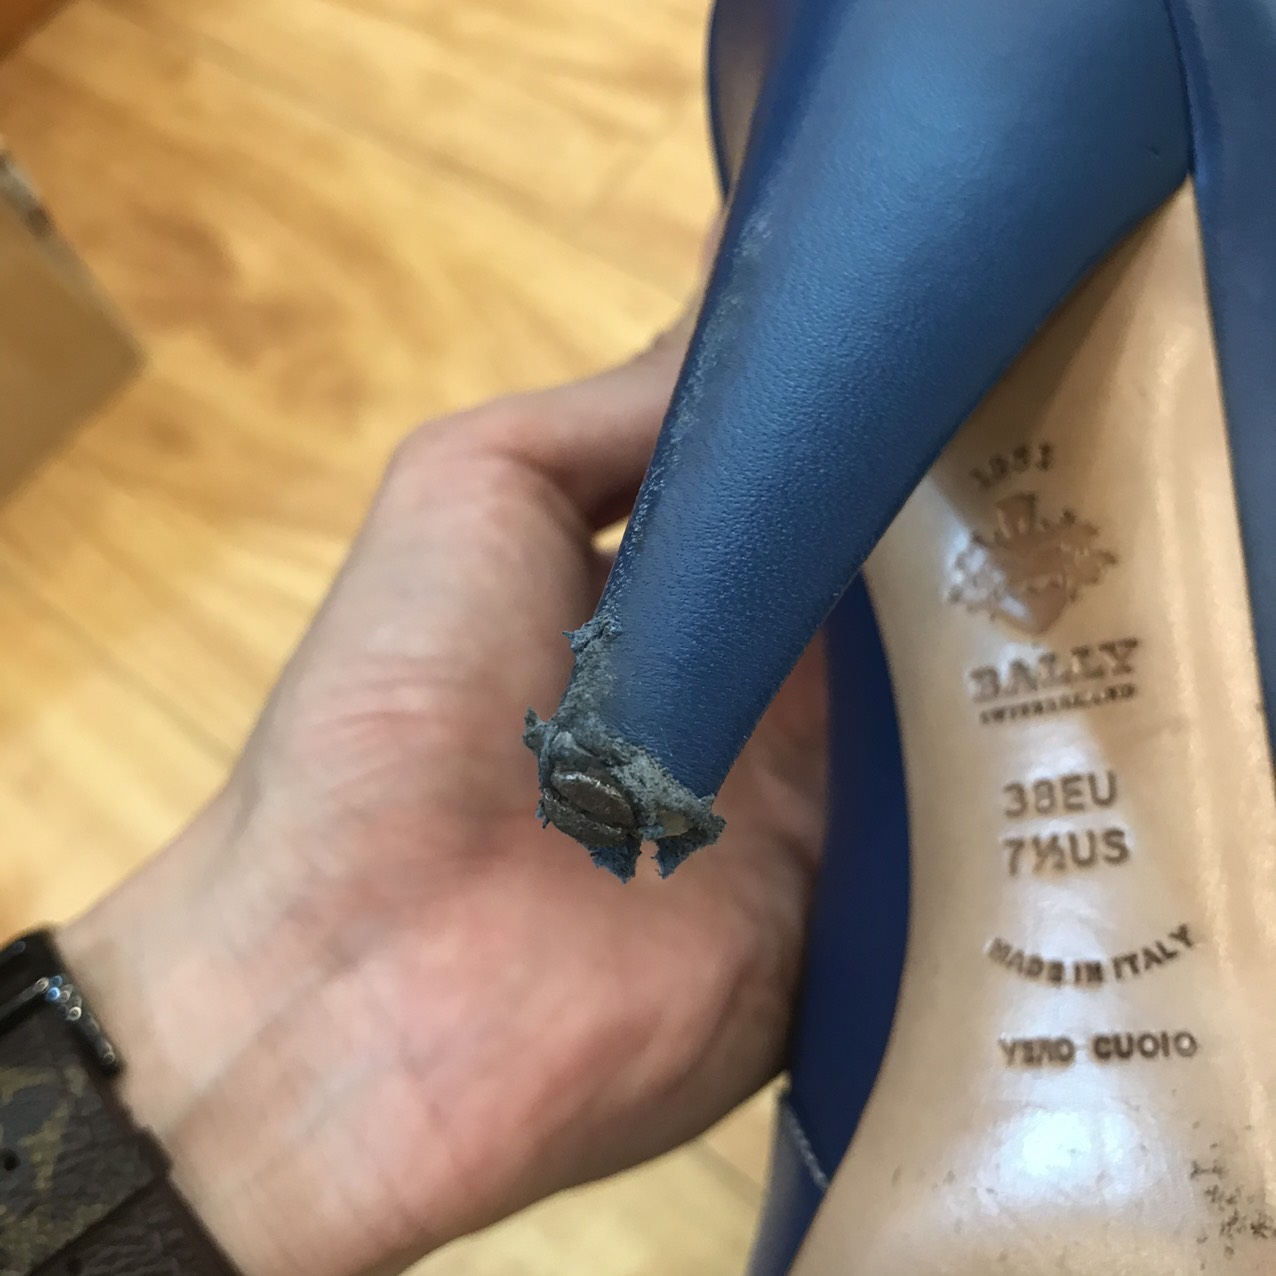 Sửa Chữa Giày Dép Gucci, Chanel, Louis Vuitton, Hermes ... 21